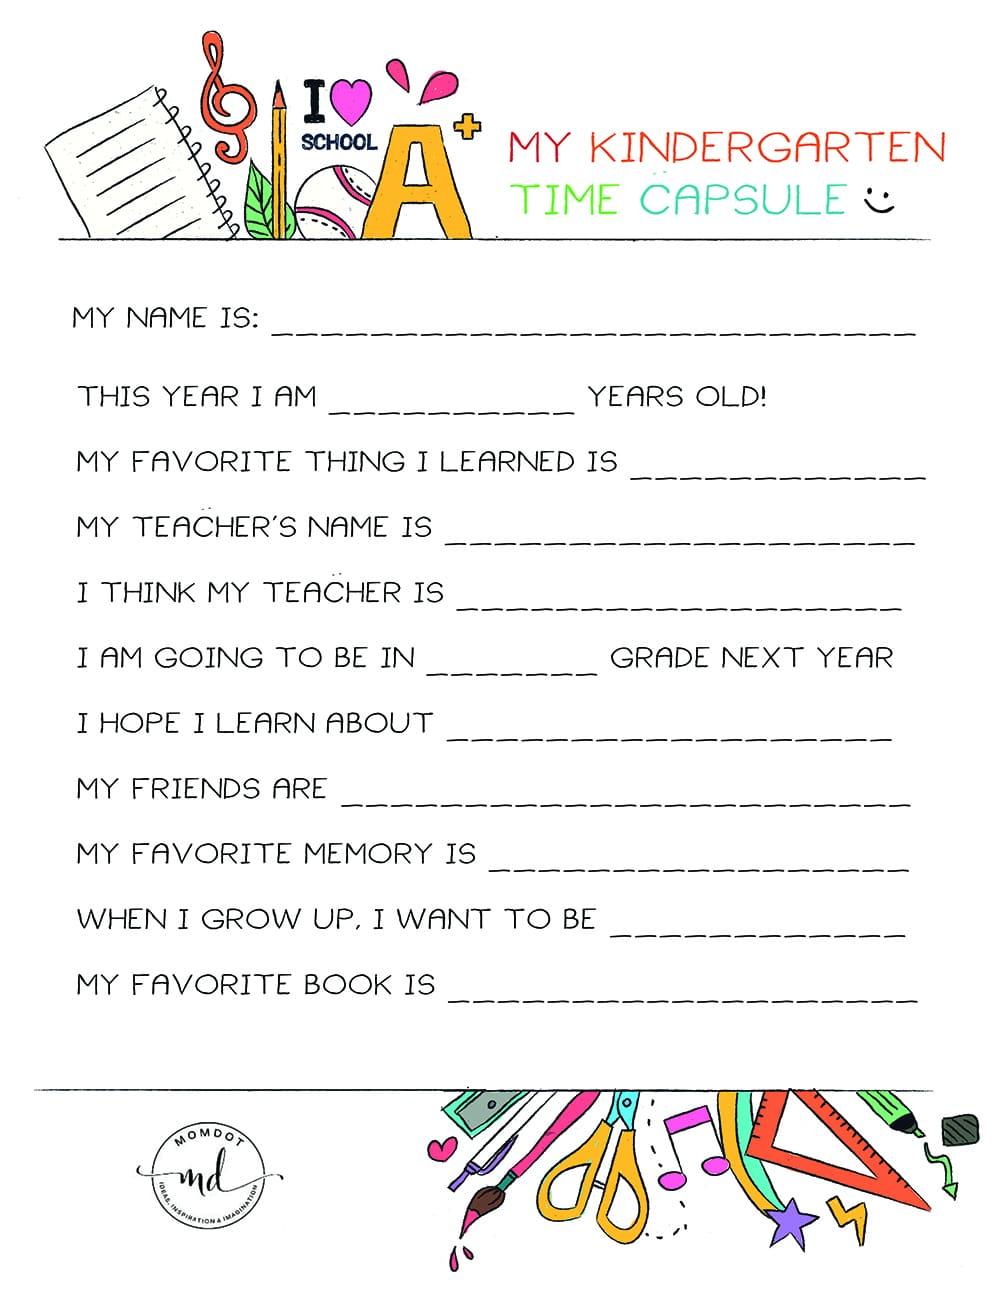 Kindergarten Time Capsule FREE PRINTABLE : End of School Printable and document in their words